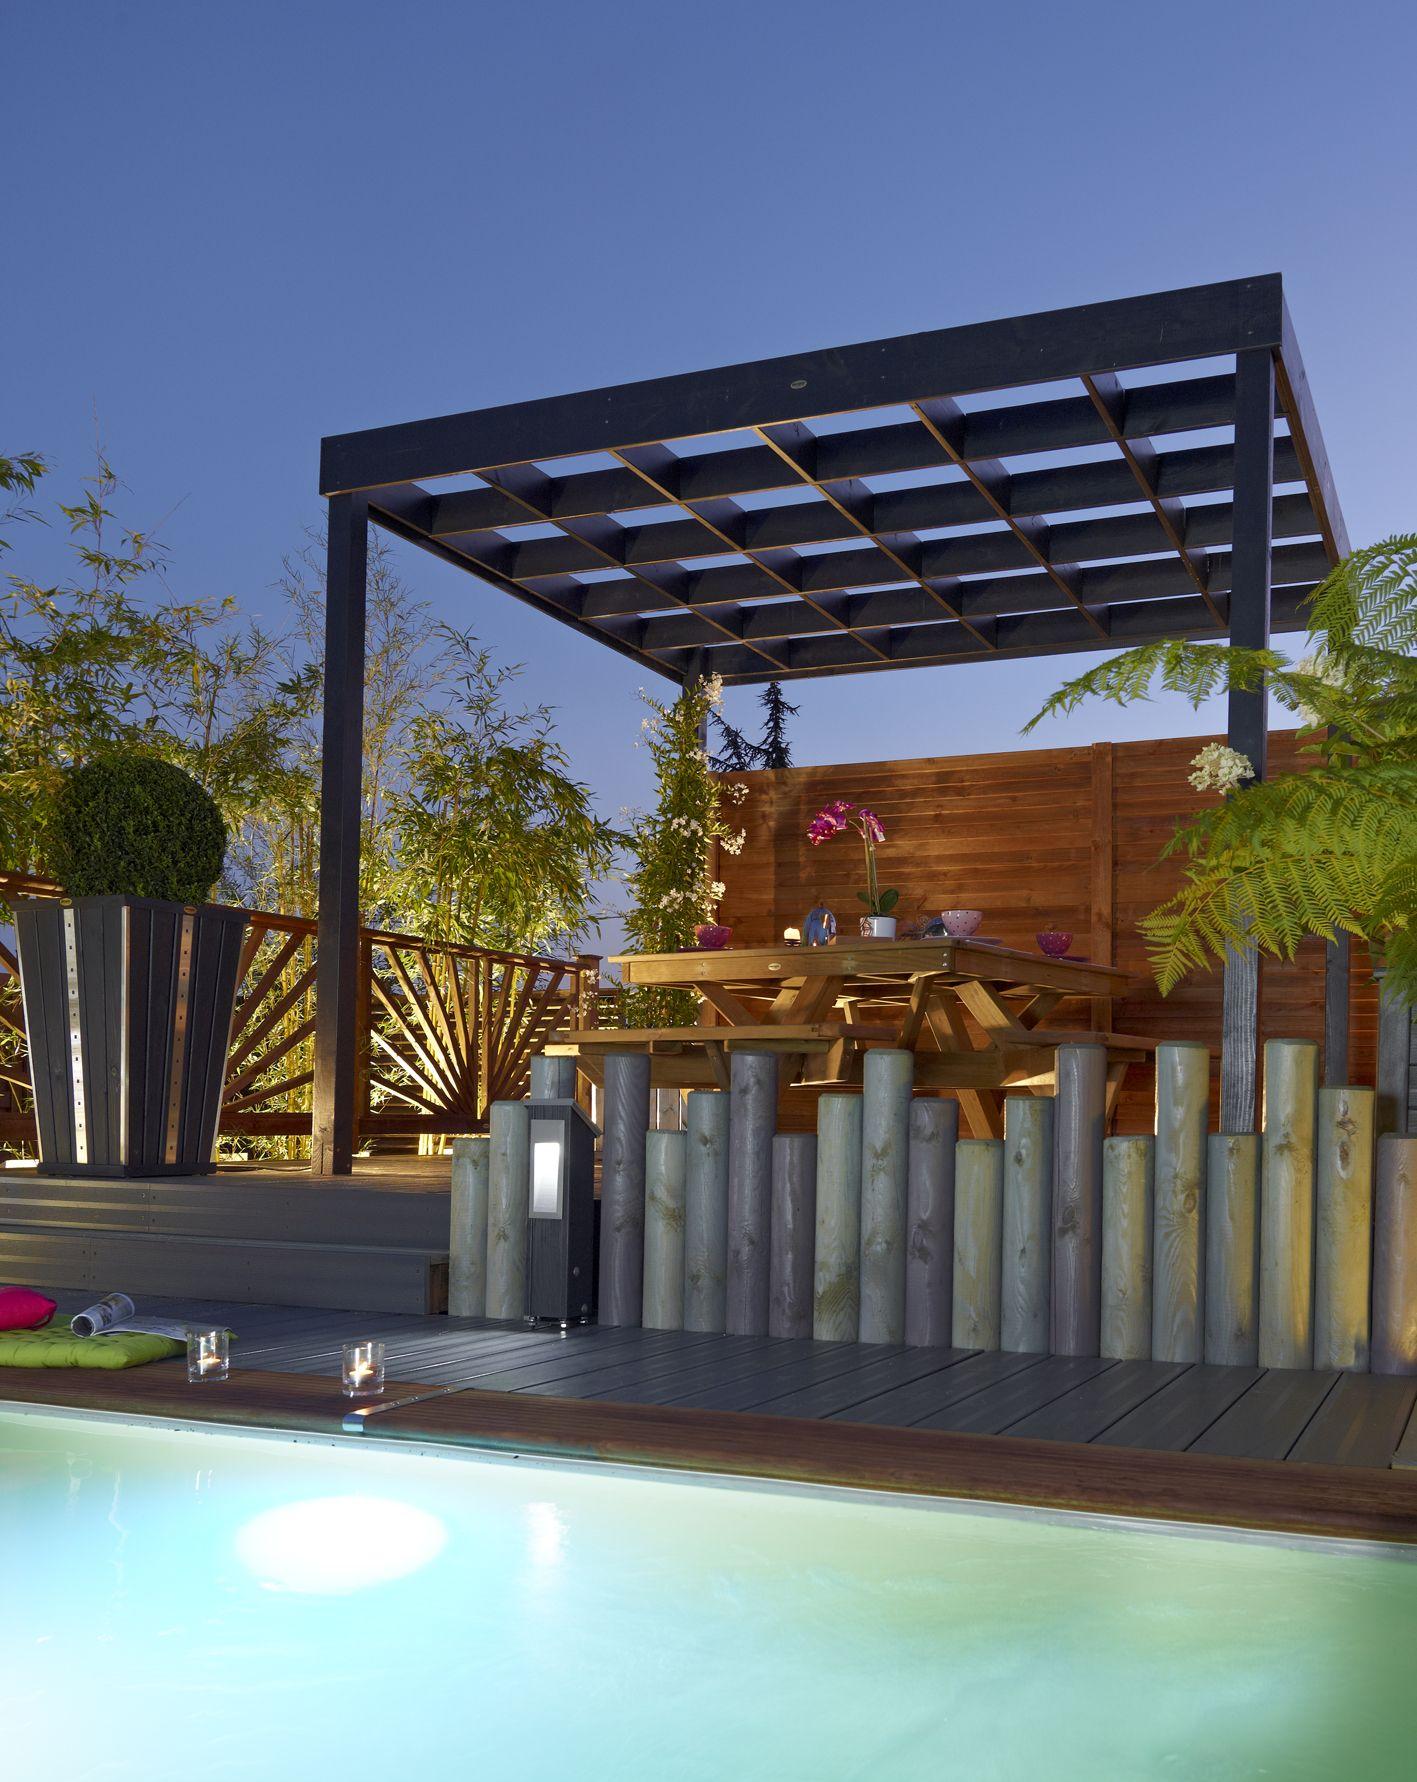 pergola esterel lasur e gris anthracite bois durapin. Black Bedroom Furniture Sets. Home Design Ideas